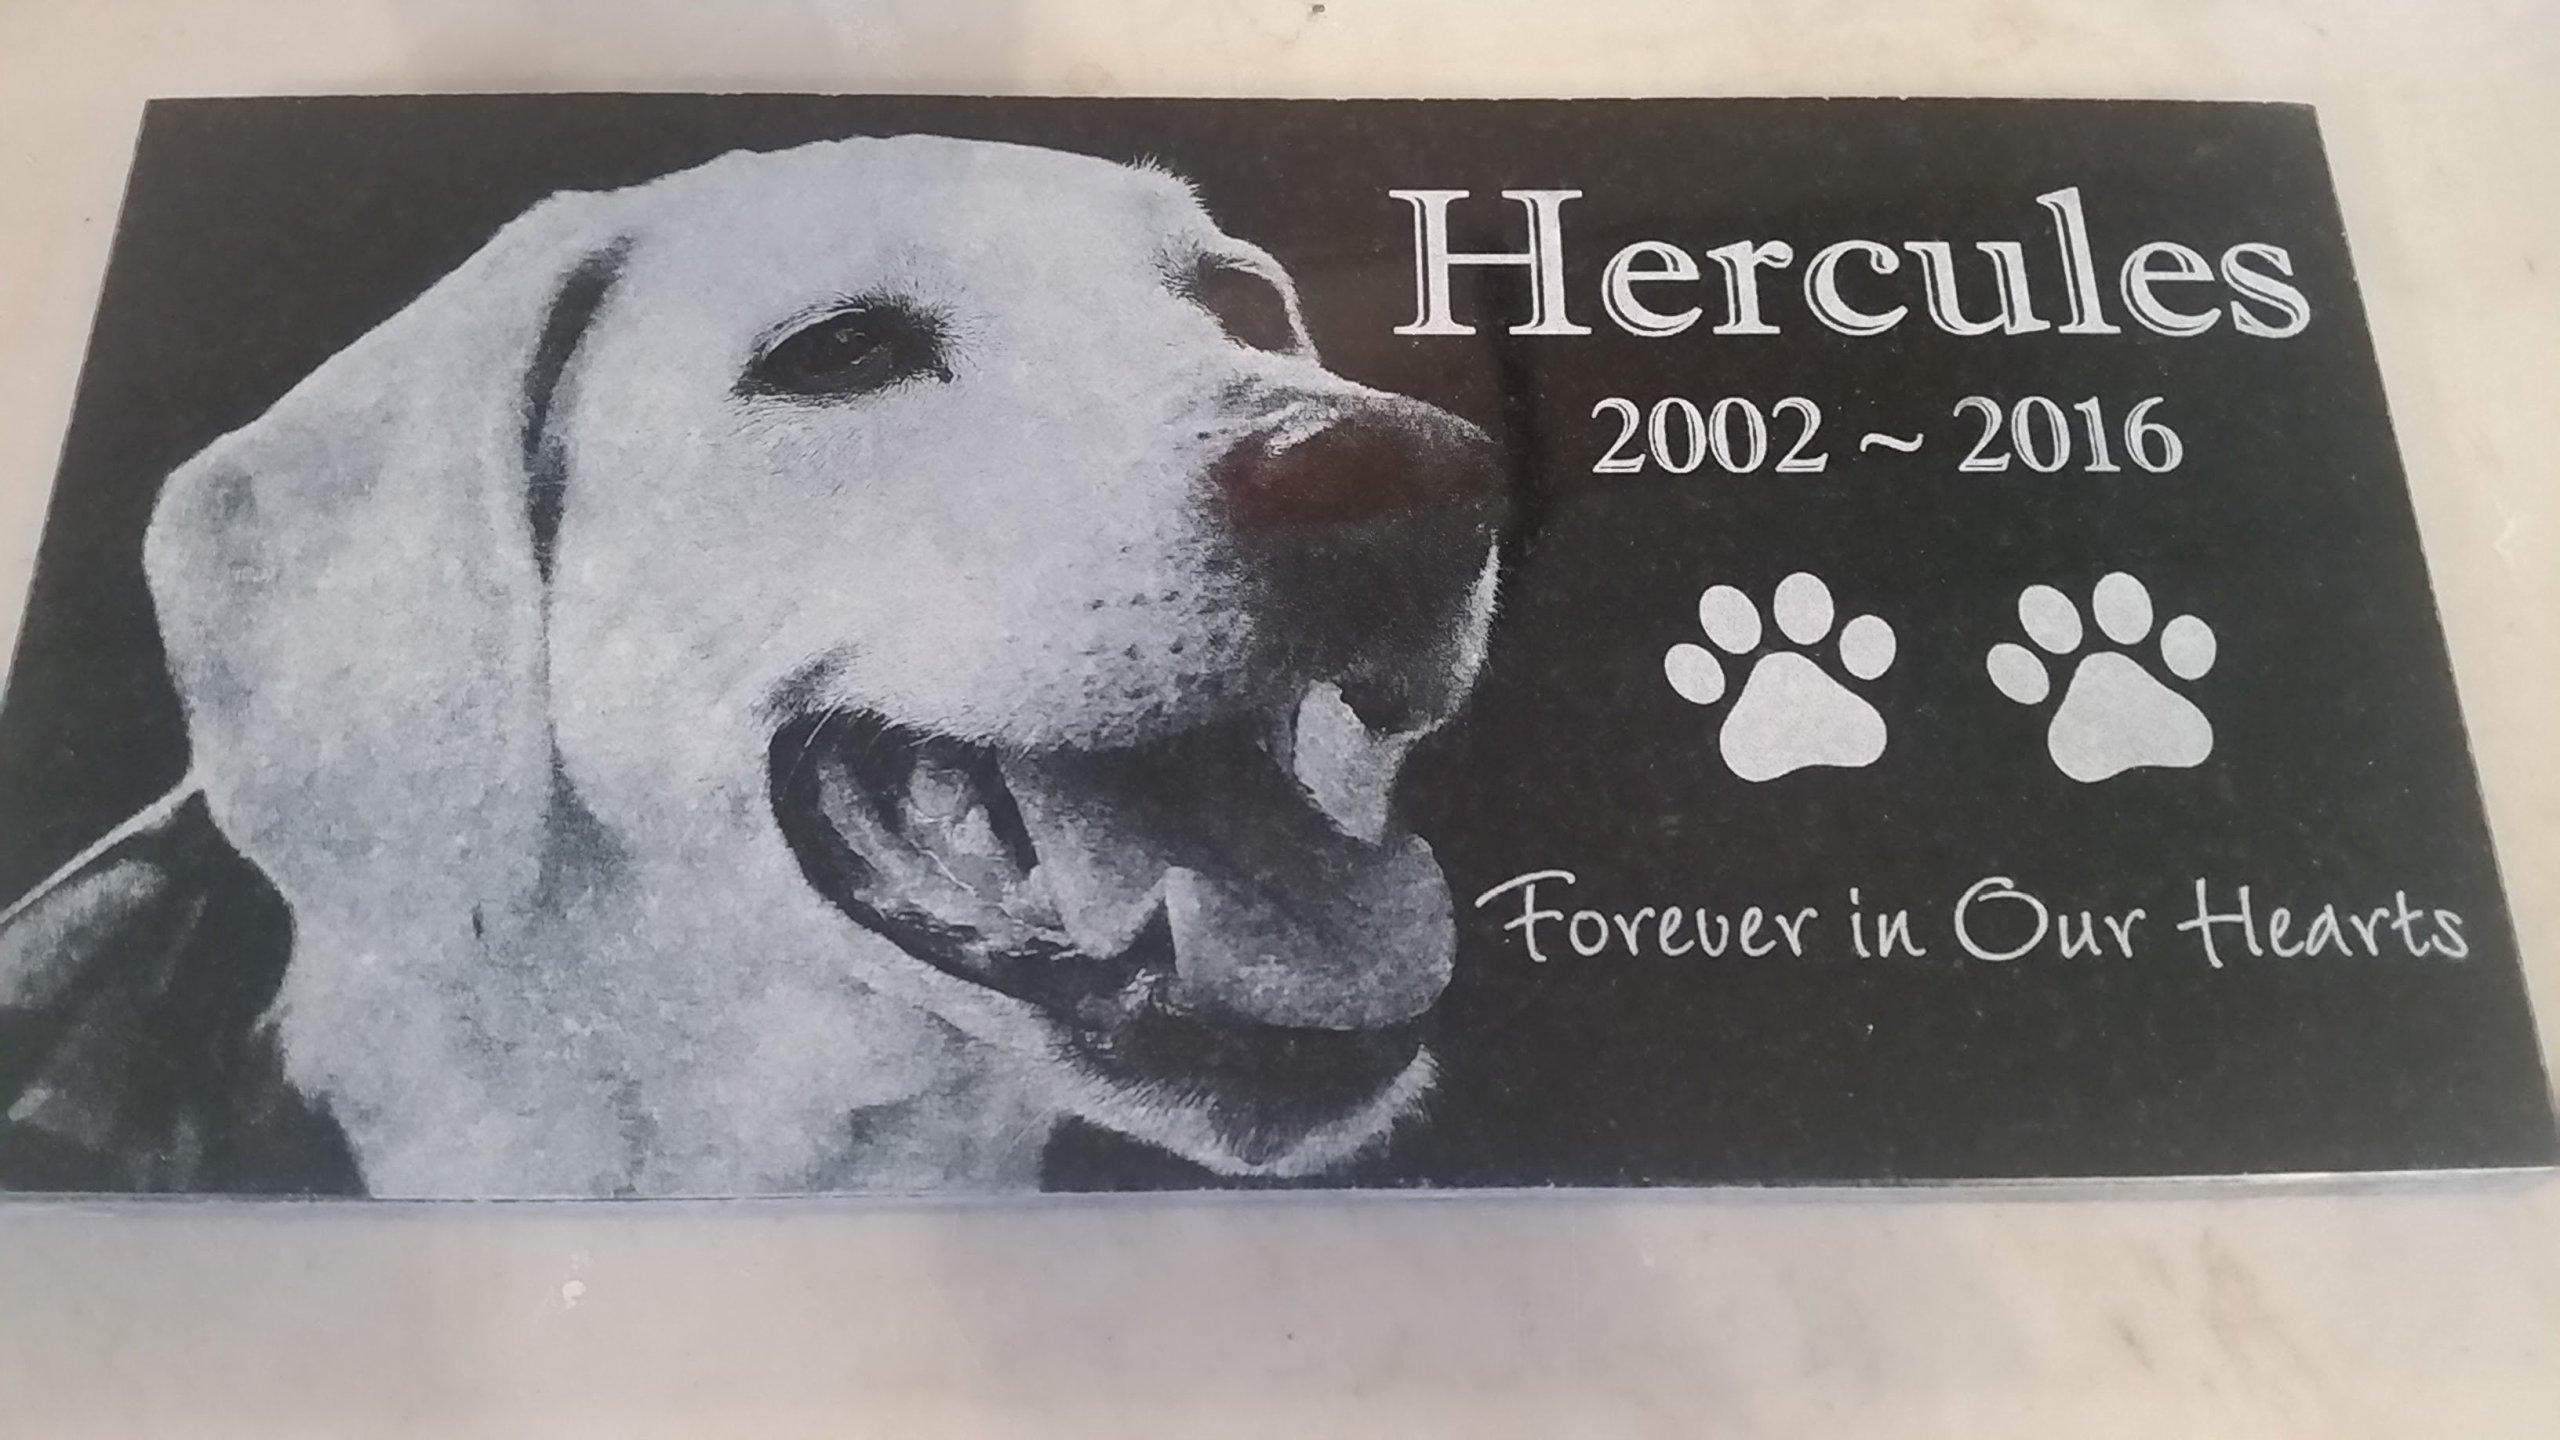 Personalised Pet Stone Memorial Marker Granite Marker Dog Cat Horse Bird Human 6'' X 12'' Retreiver Labrador Golden